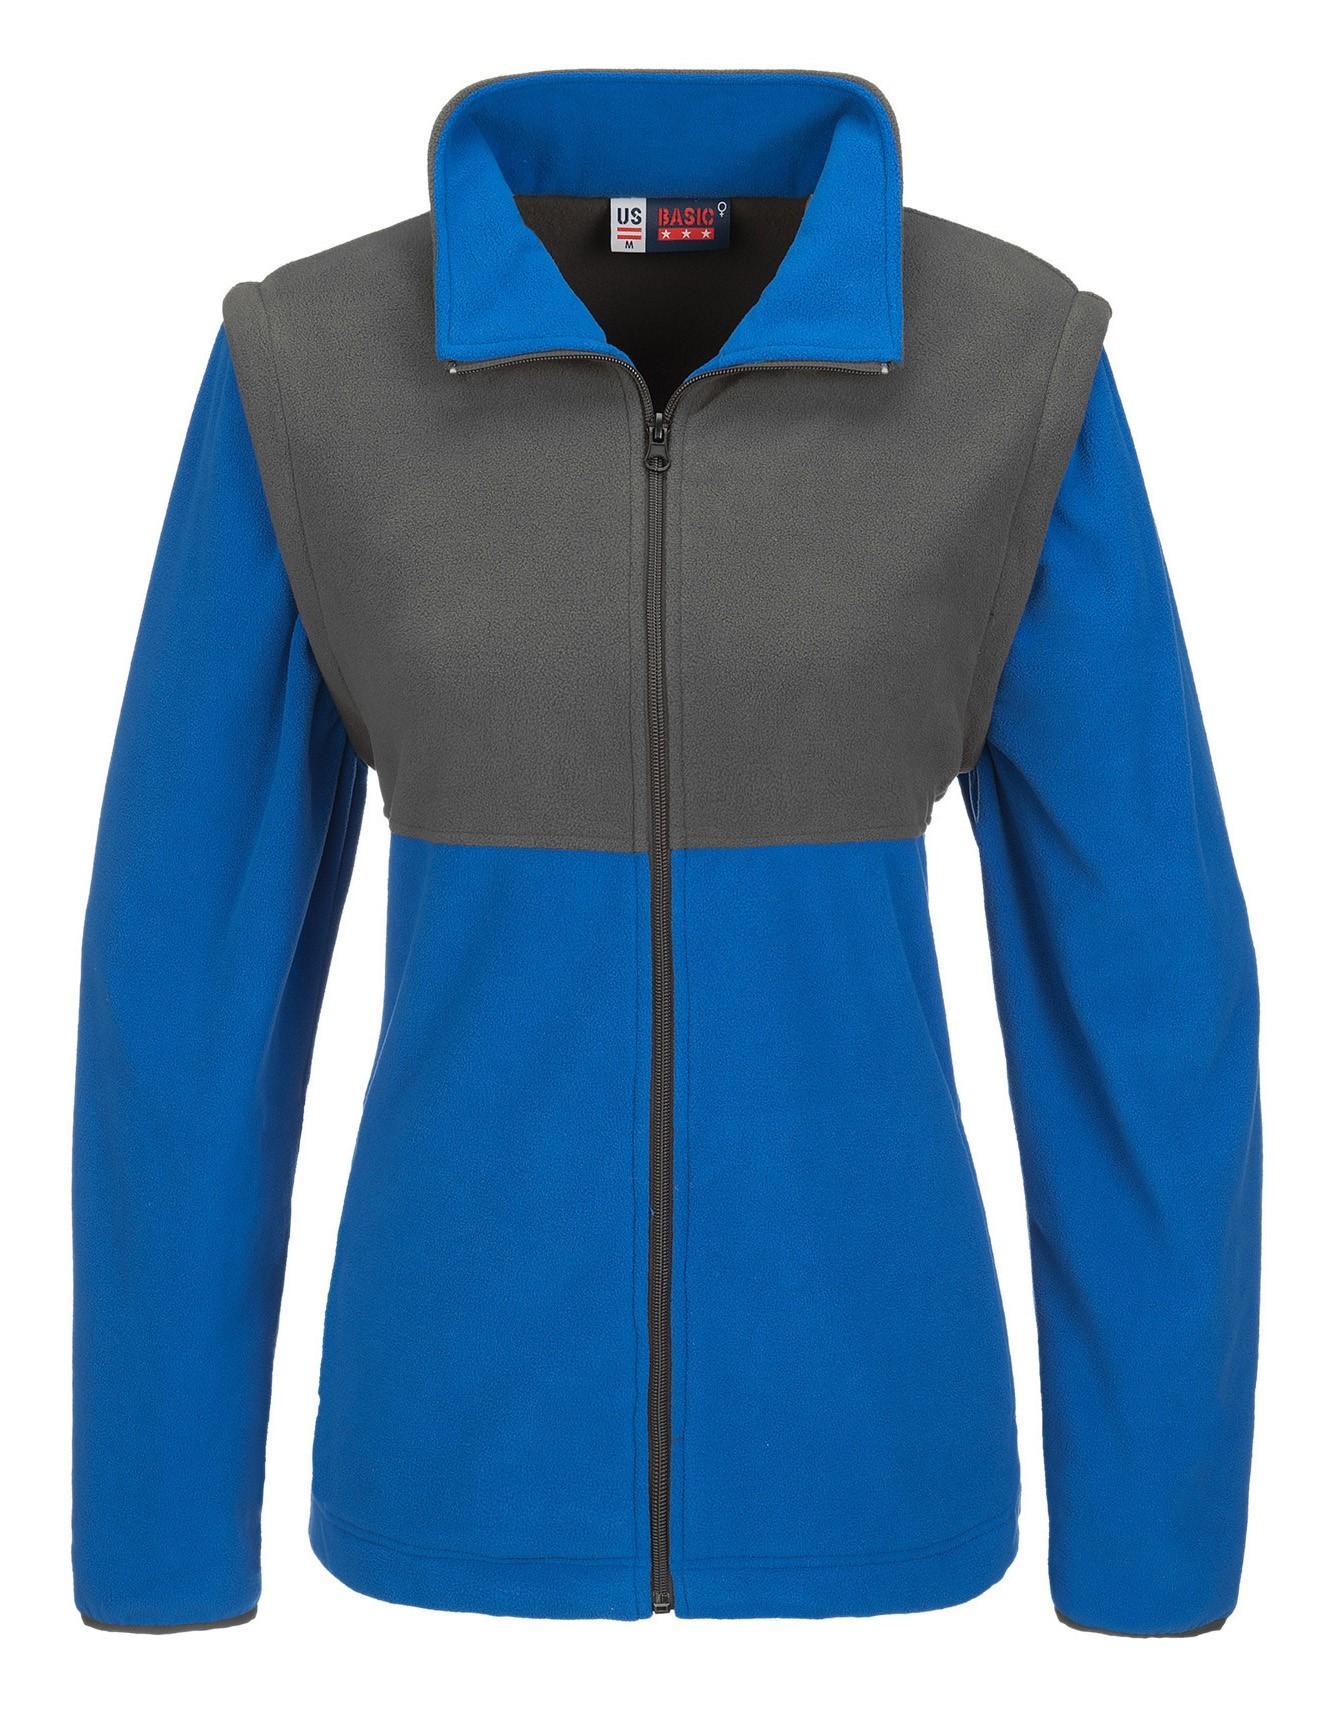 Ladies Benneton Zip-off Micro Fleece Jacket - Blue Only